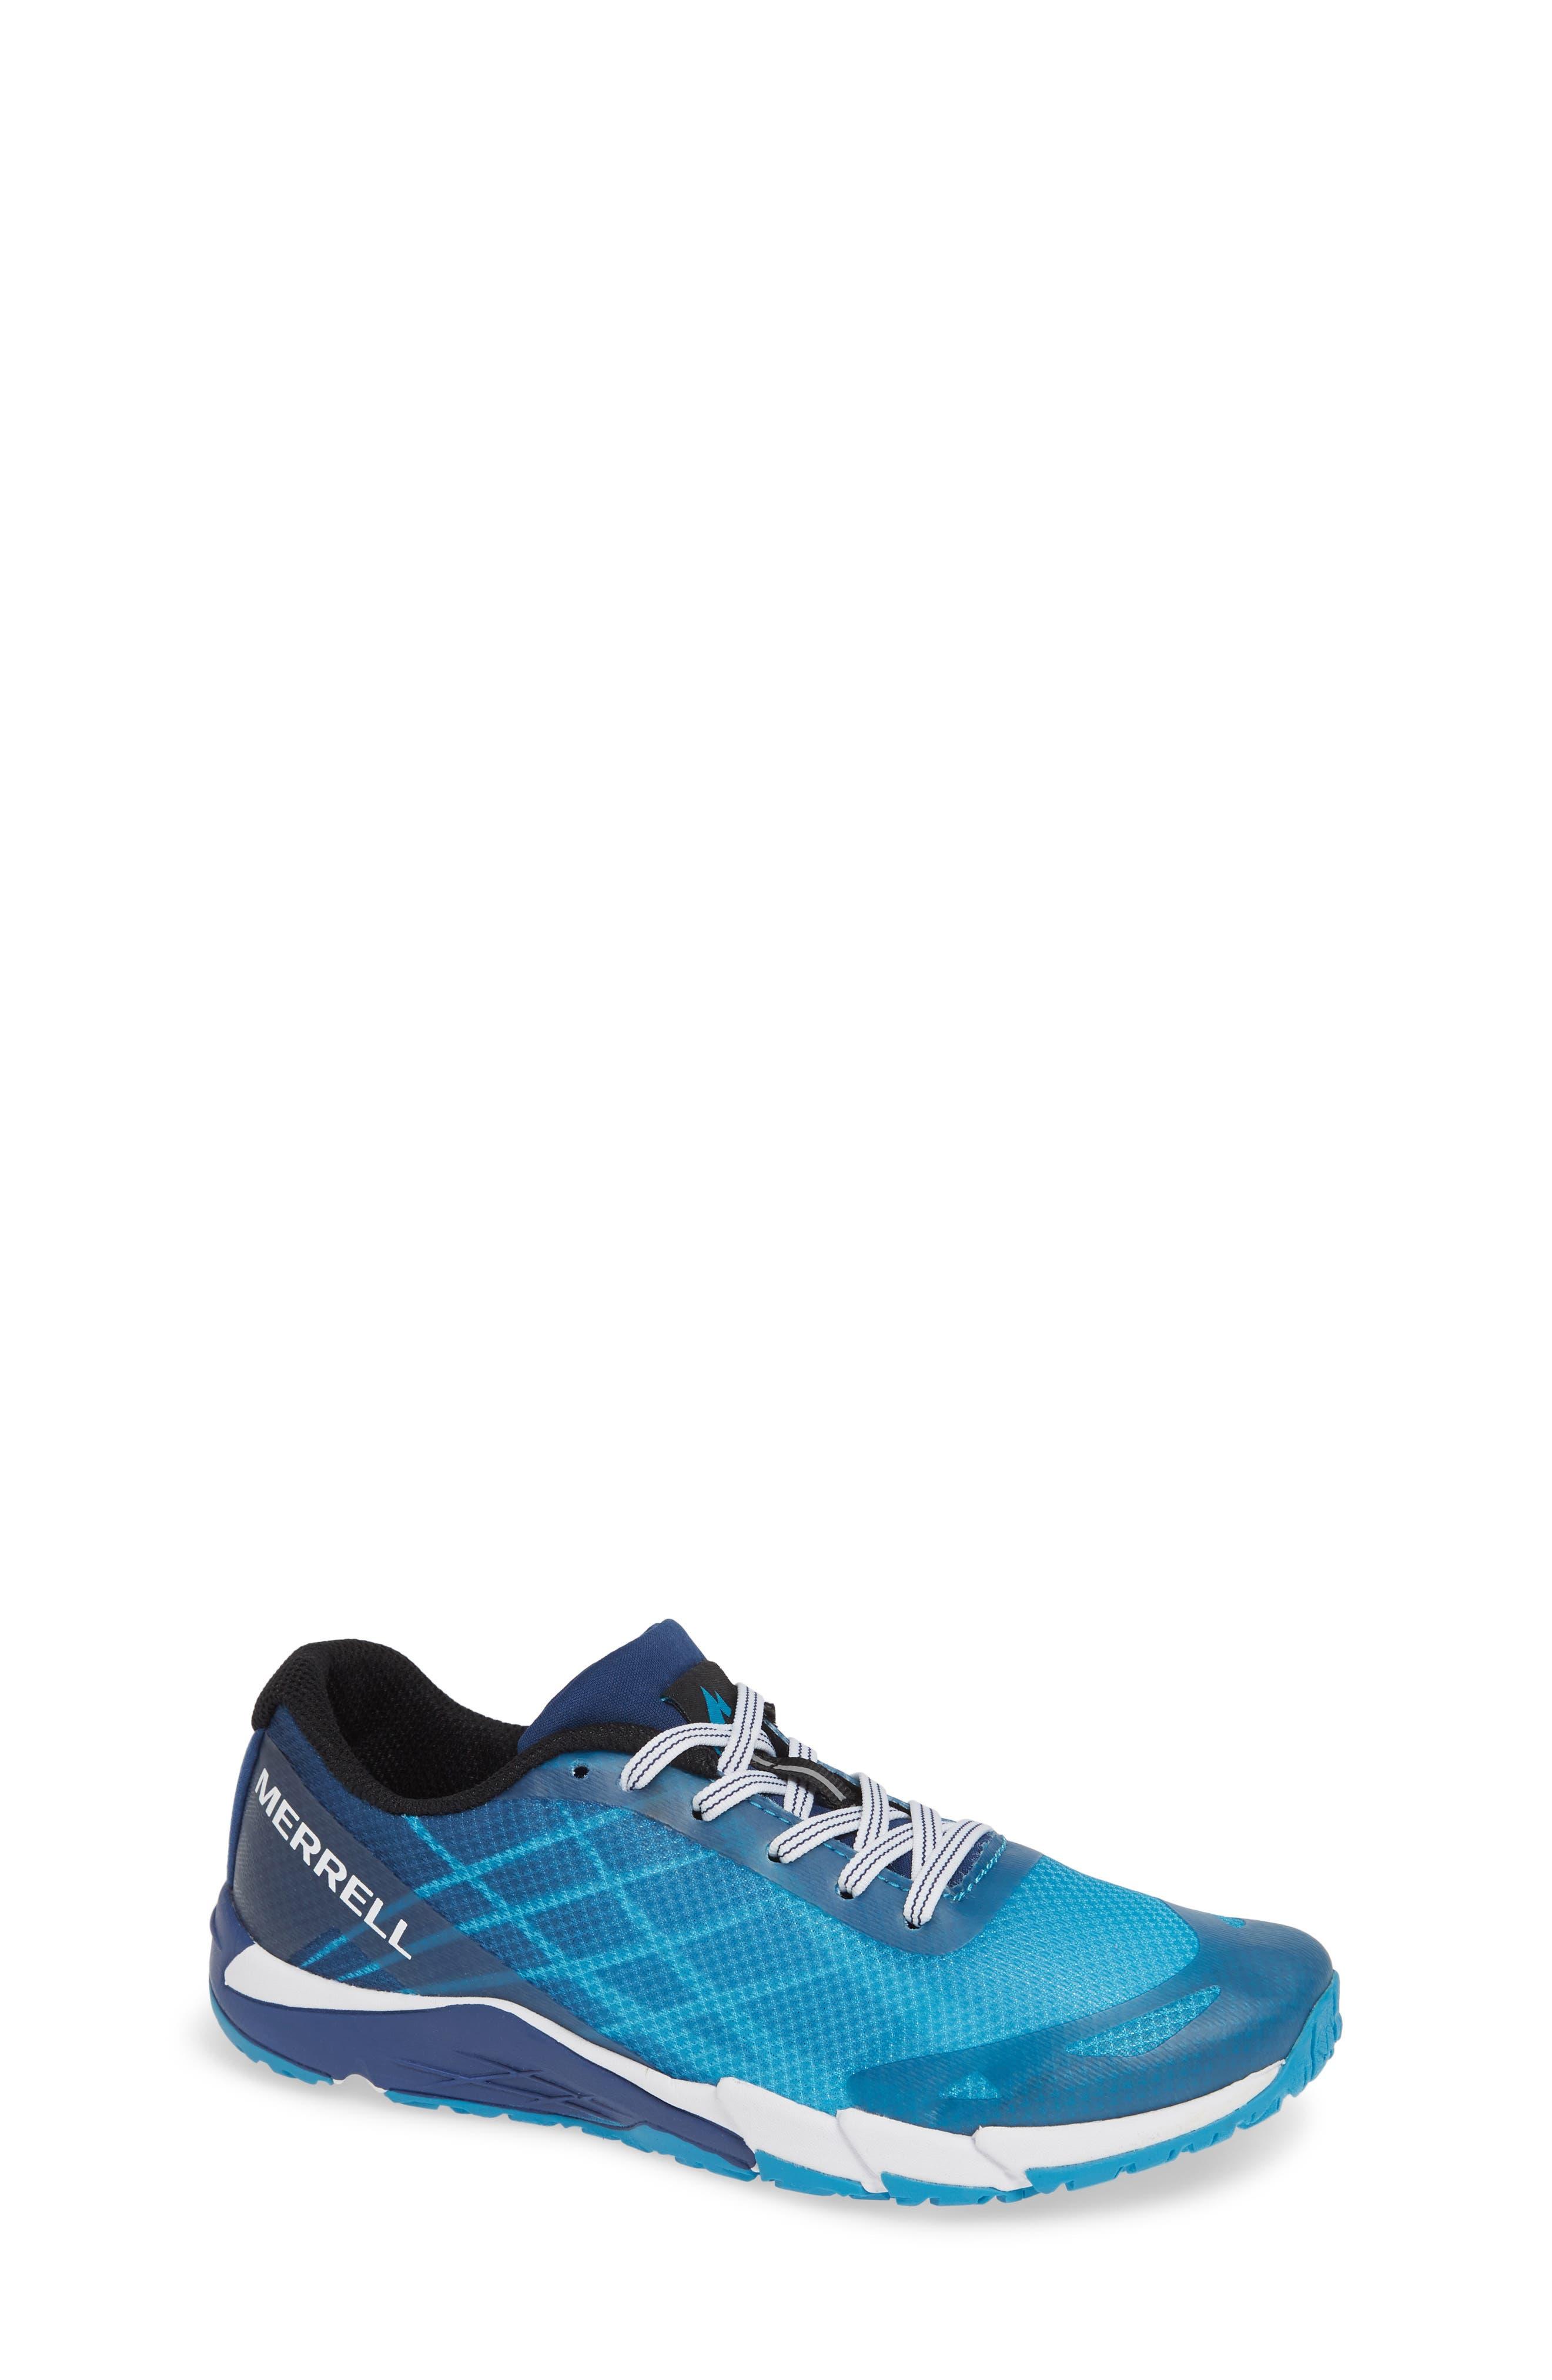 Kids Merrell Bare Access Sneaker Size 4 M  Blue